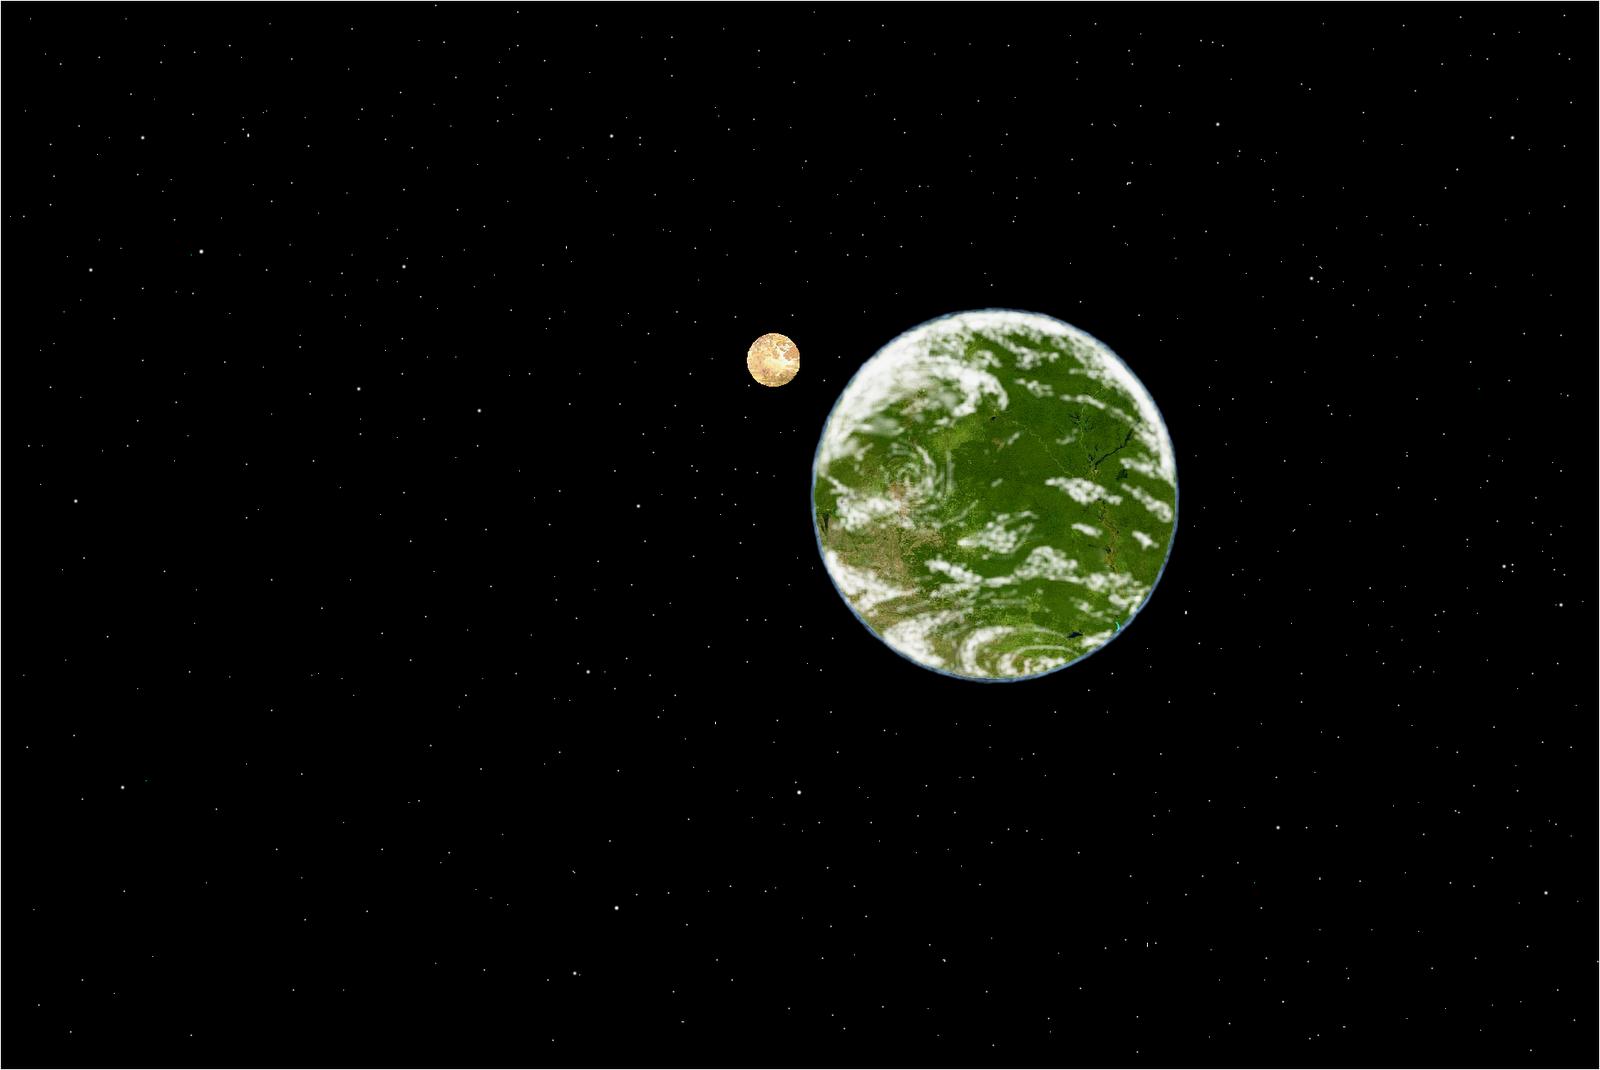 gliese 581 c info - photo #25